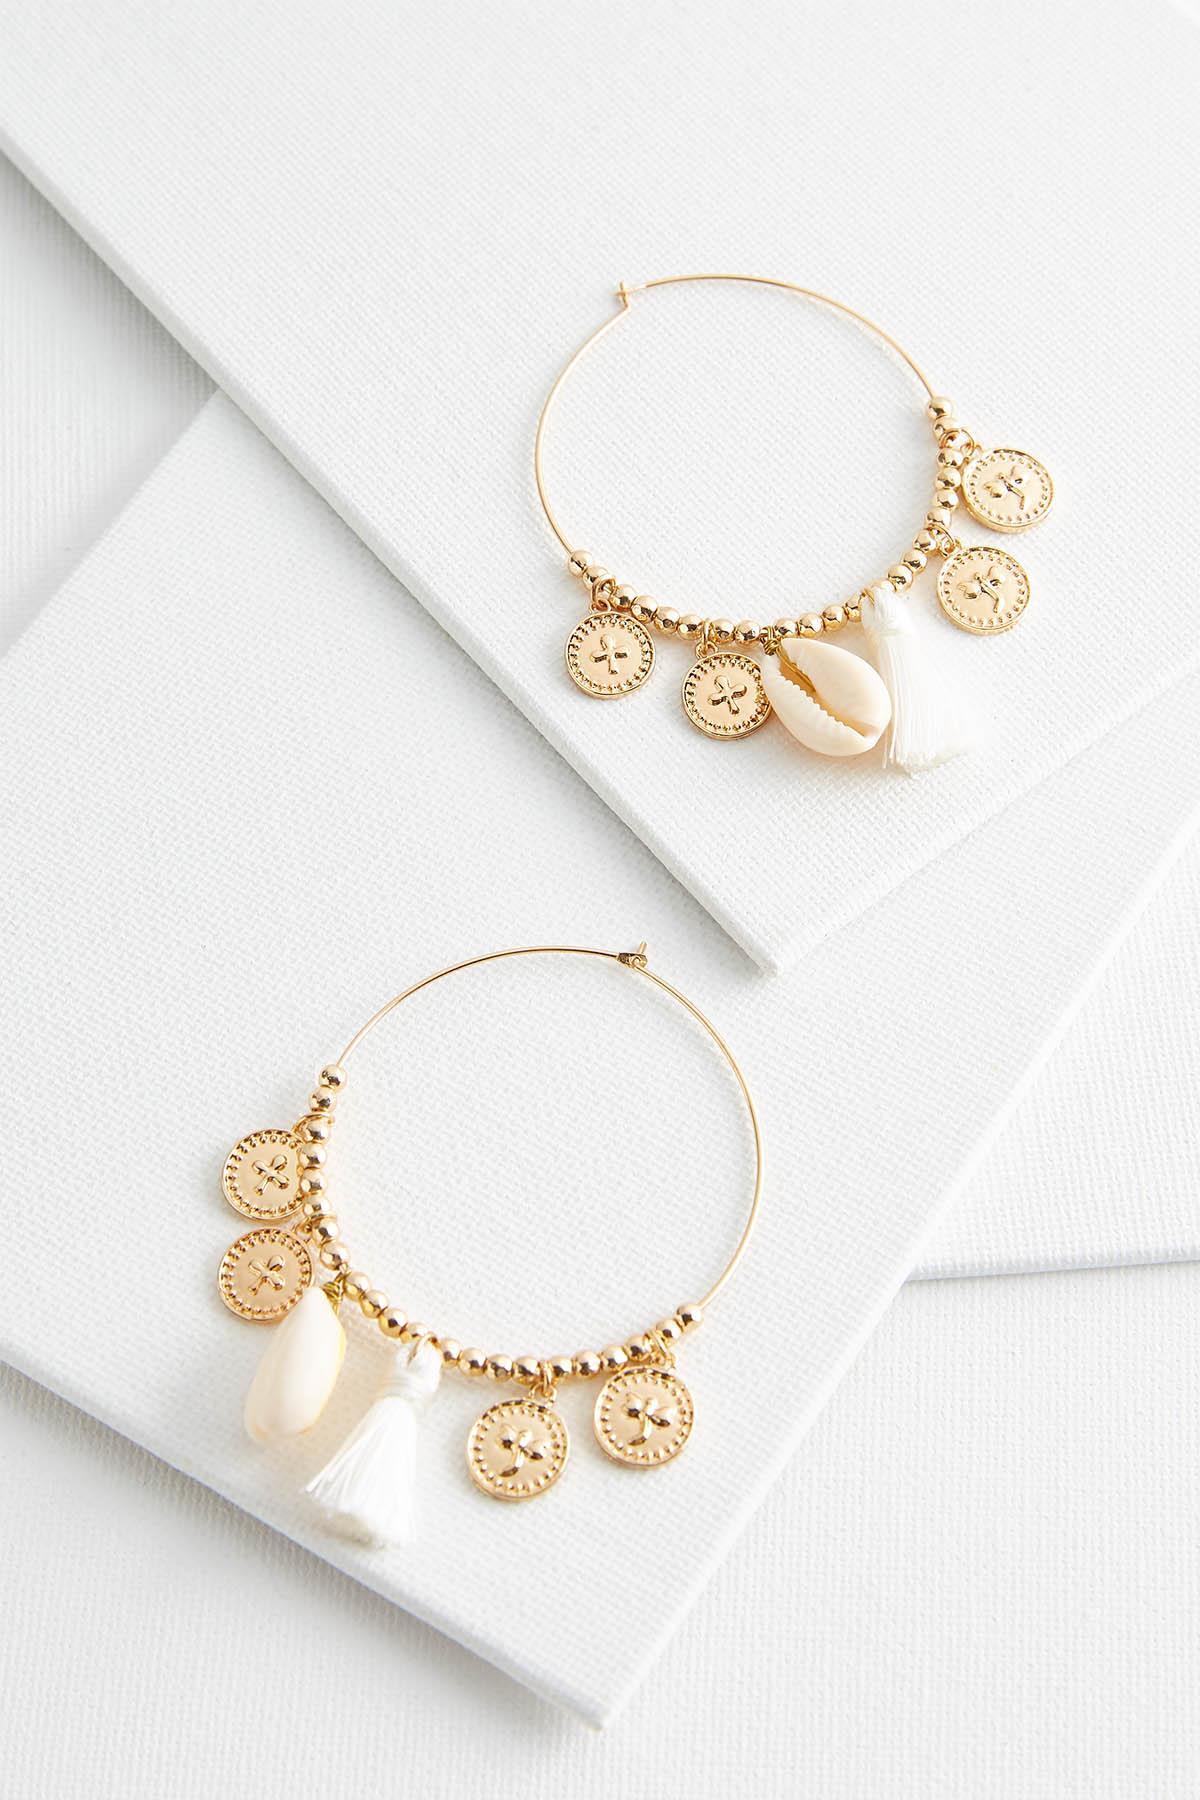 Tasseled Shell Hoop Earrings